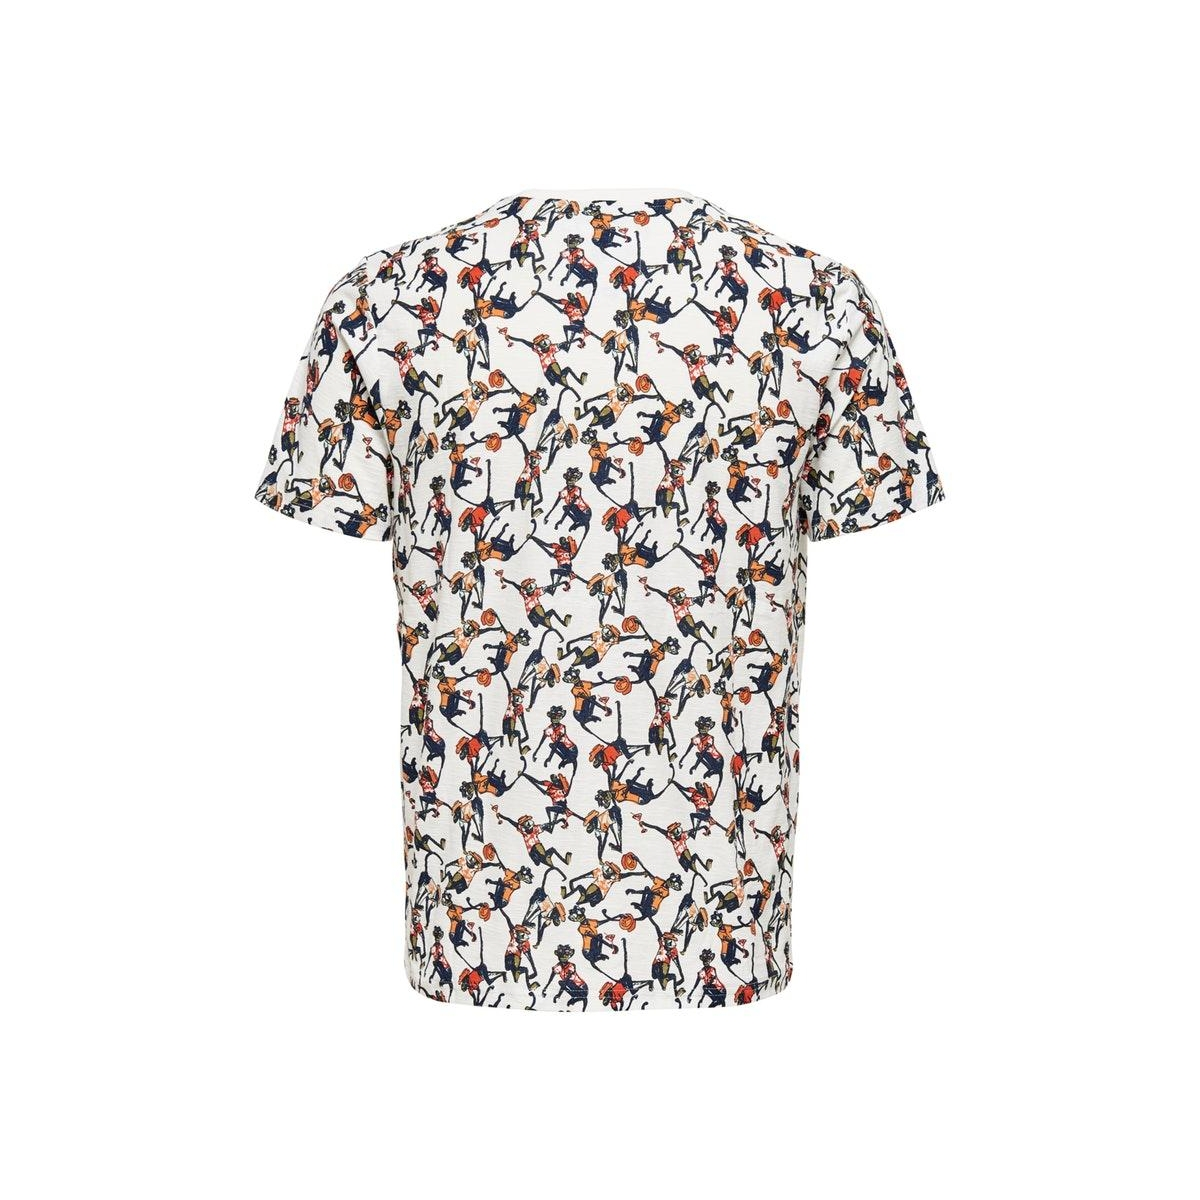 onsedgarki life slim ss tee nf 6542 22016542 only & sons t-shirt cloud dancer